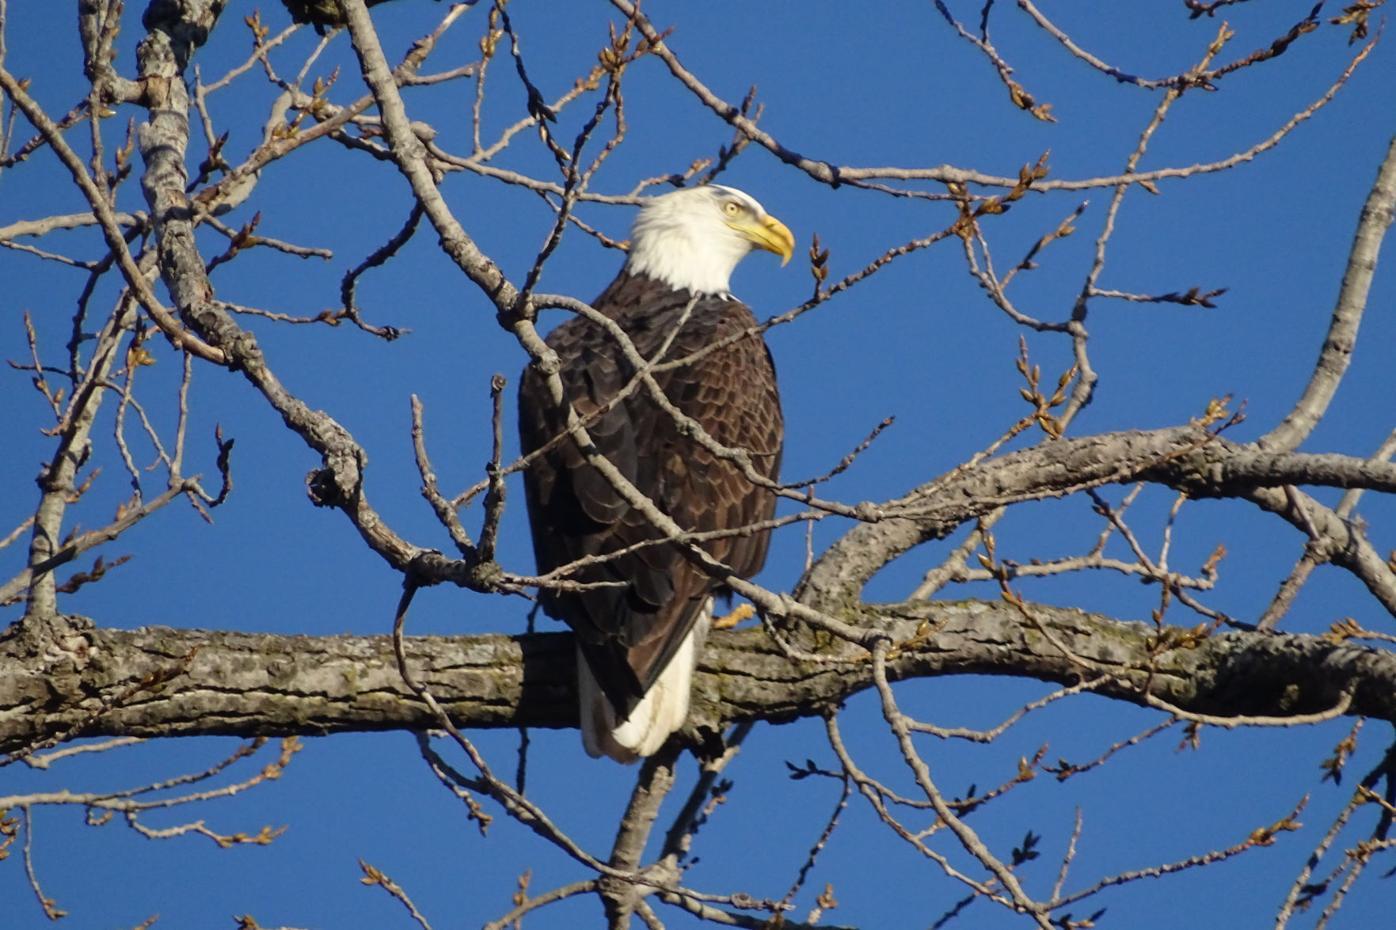 Bald eagle at Quinsippi Island